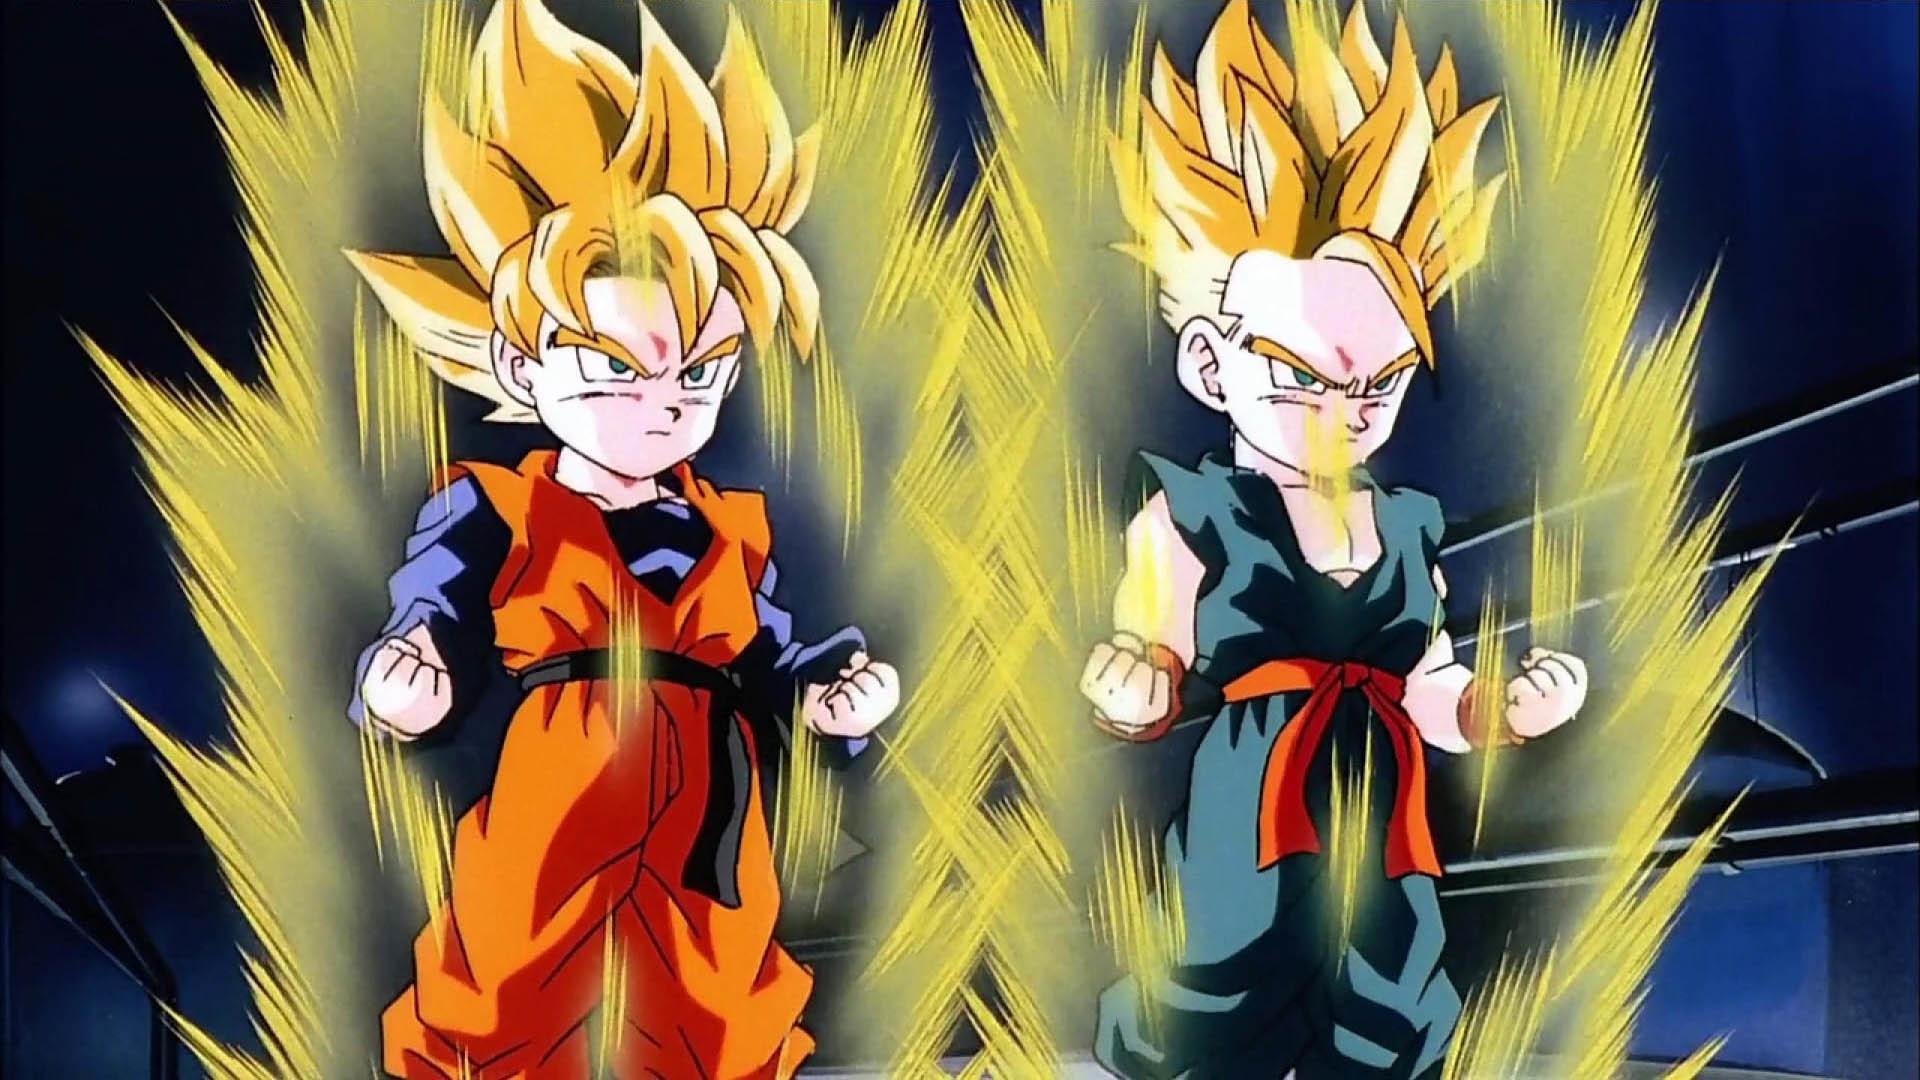 Goten and Trunks Super Saiyans wallpaper